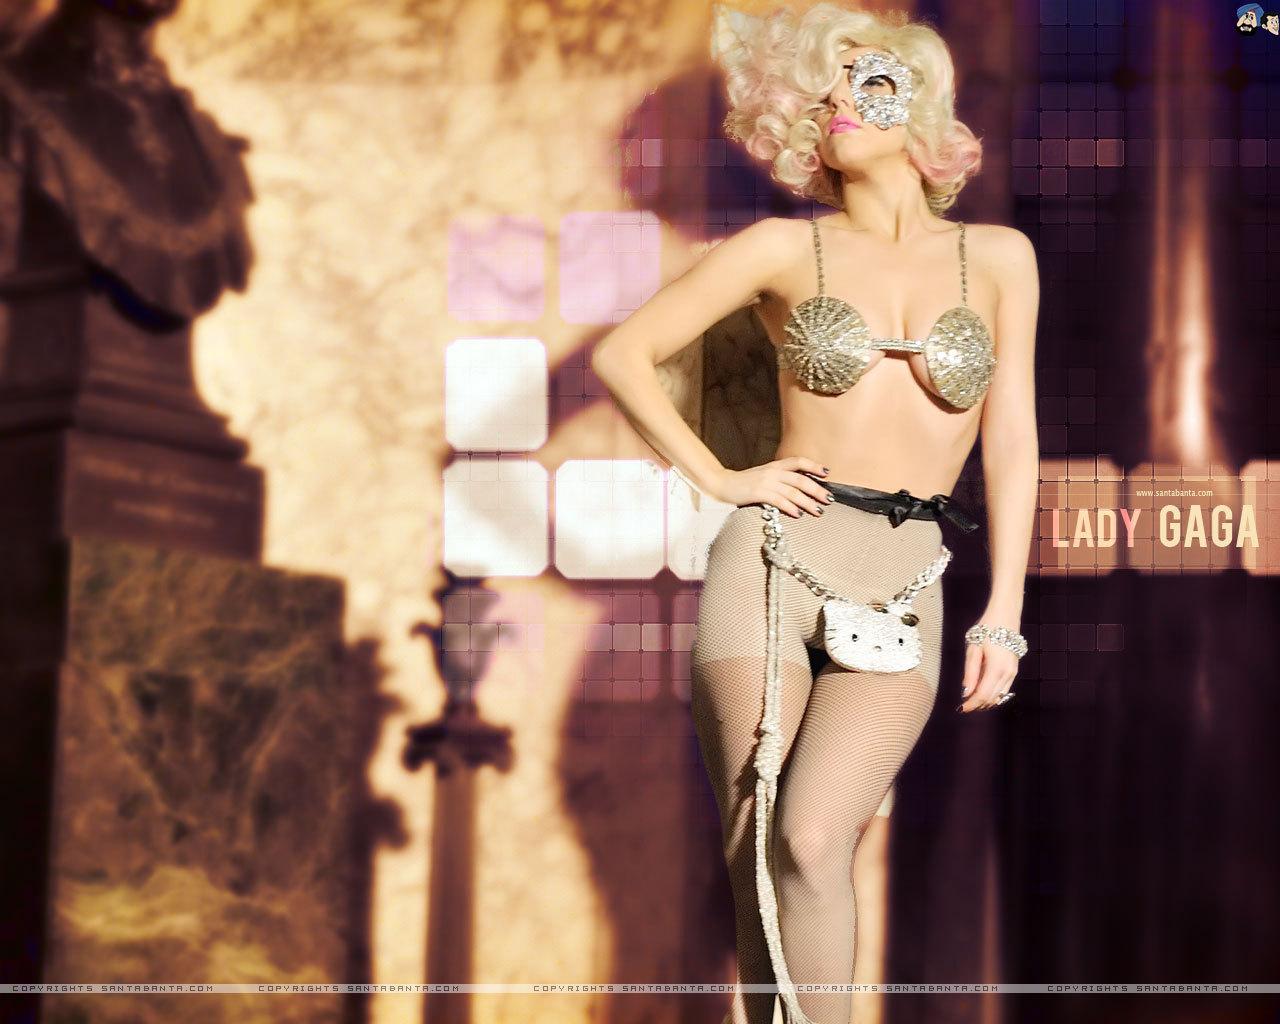 http://2.bp.blogspot.com/_H0uIwgk-kRY/TQuvHY7LlUI/AAAAAAAABA0/mw9NxACjweM/s1600/Lady+Gaga+%252314+1280x1024.jpg